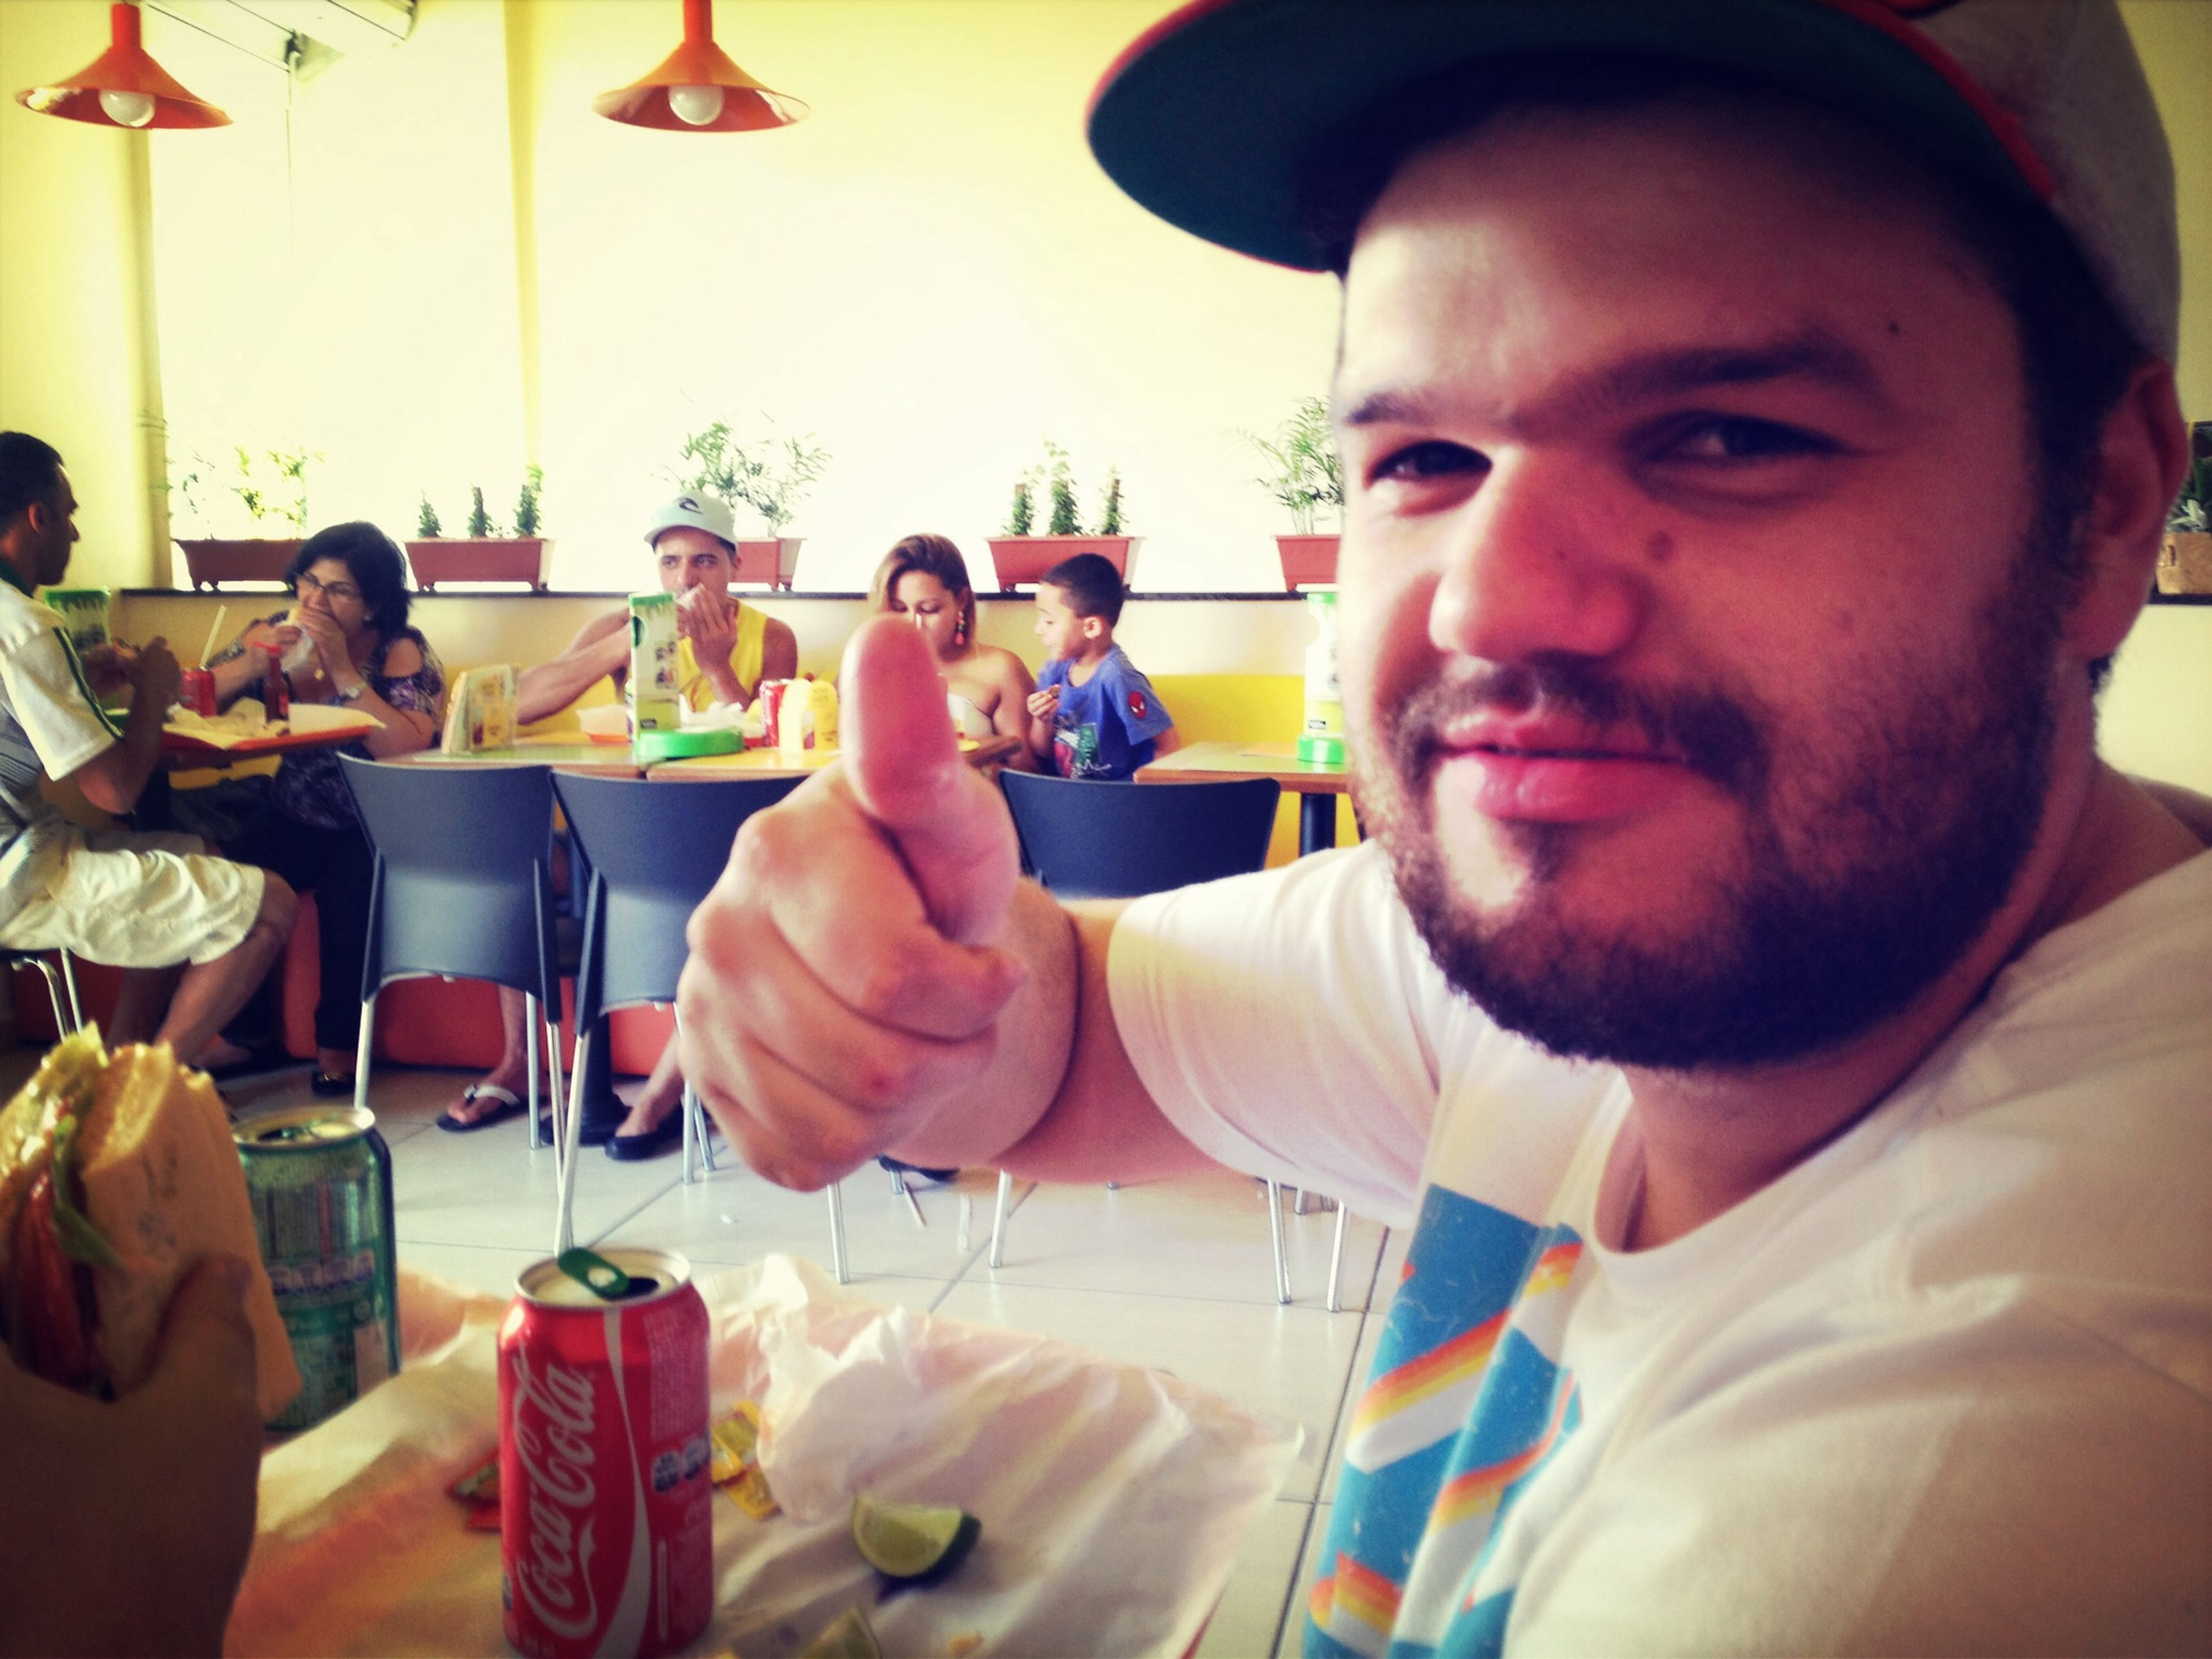 Aeeee guizão sucesso!!! Aprovadíssimo \o/ Bombaguete Food Awesome Sunday